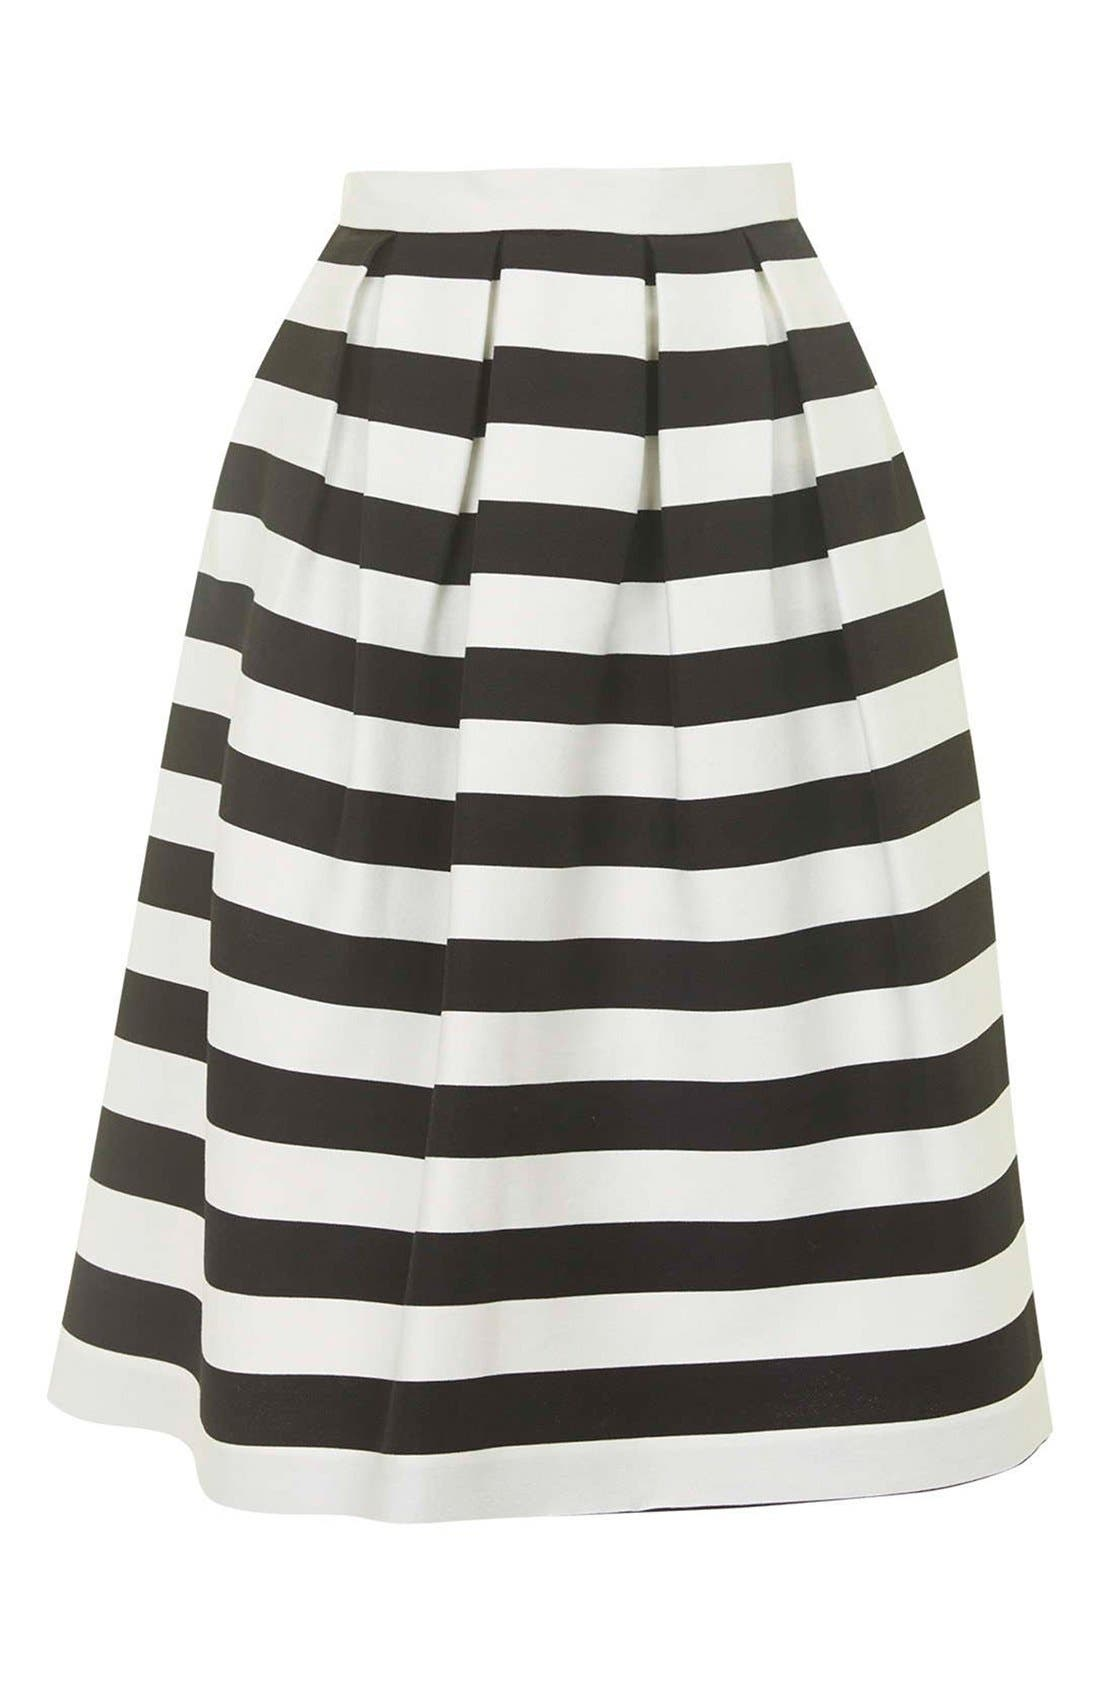 TOPSHOP, Stripe Midi Skirt, Alternate thumbnail 4, color, 001